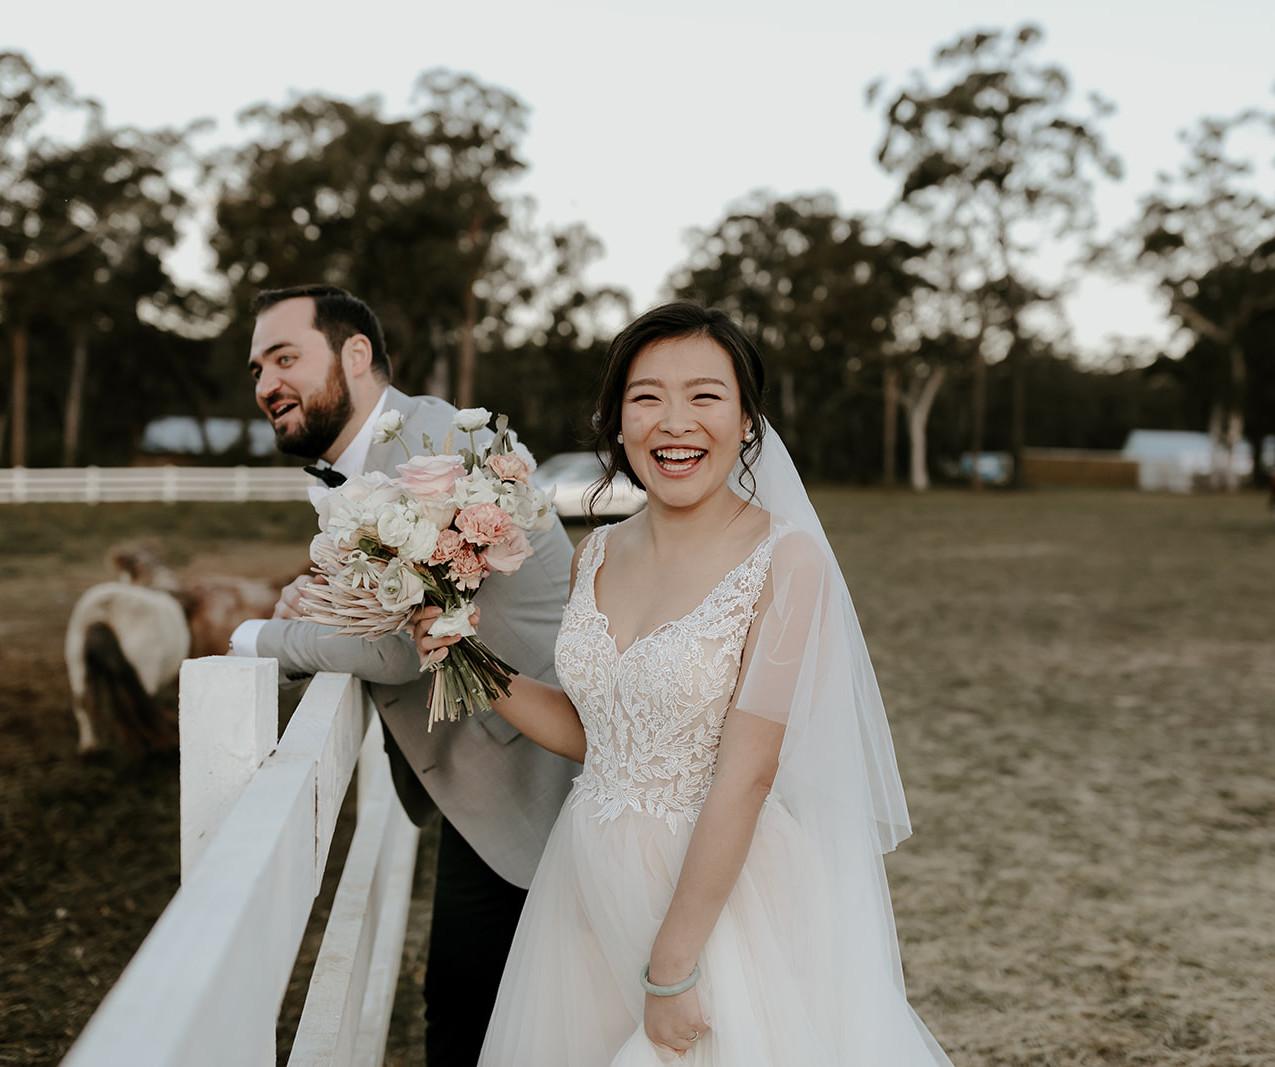 Farm Wedding Sydney  Photography: Zoe Morley Photography